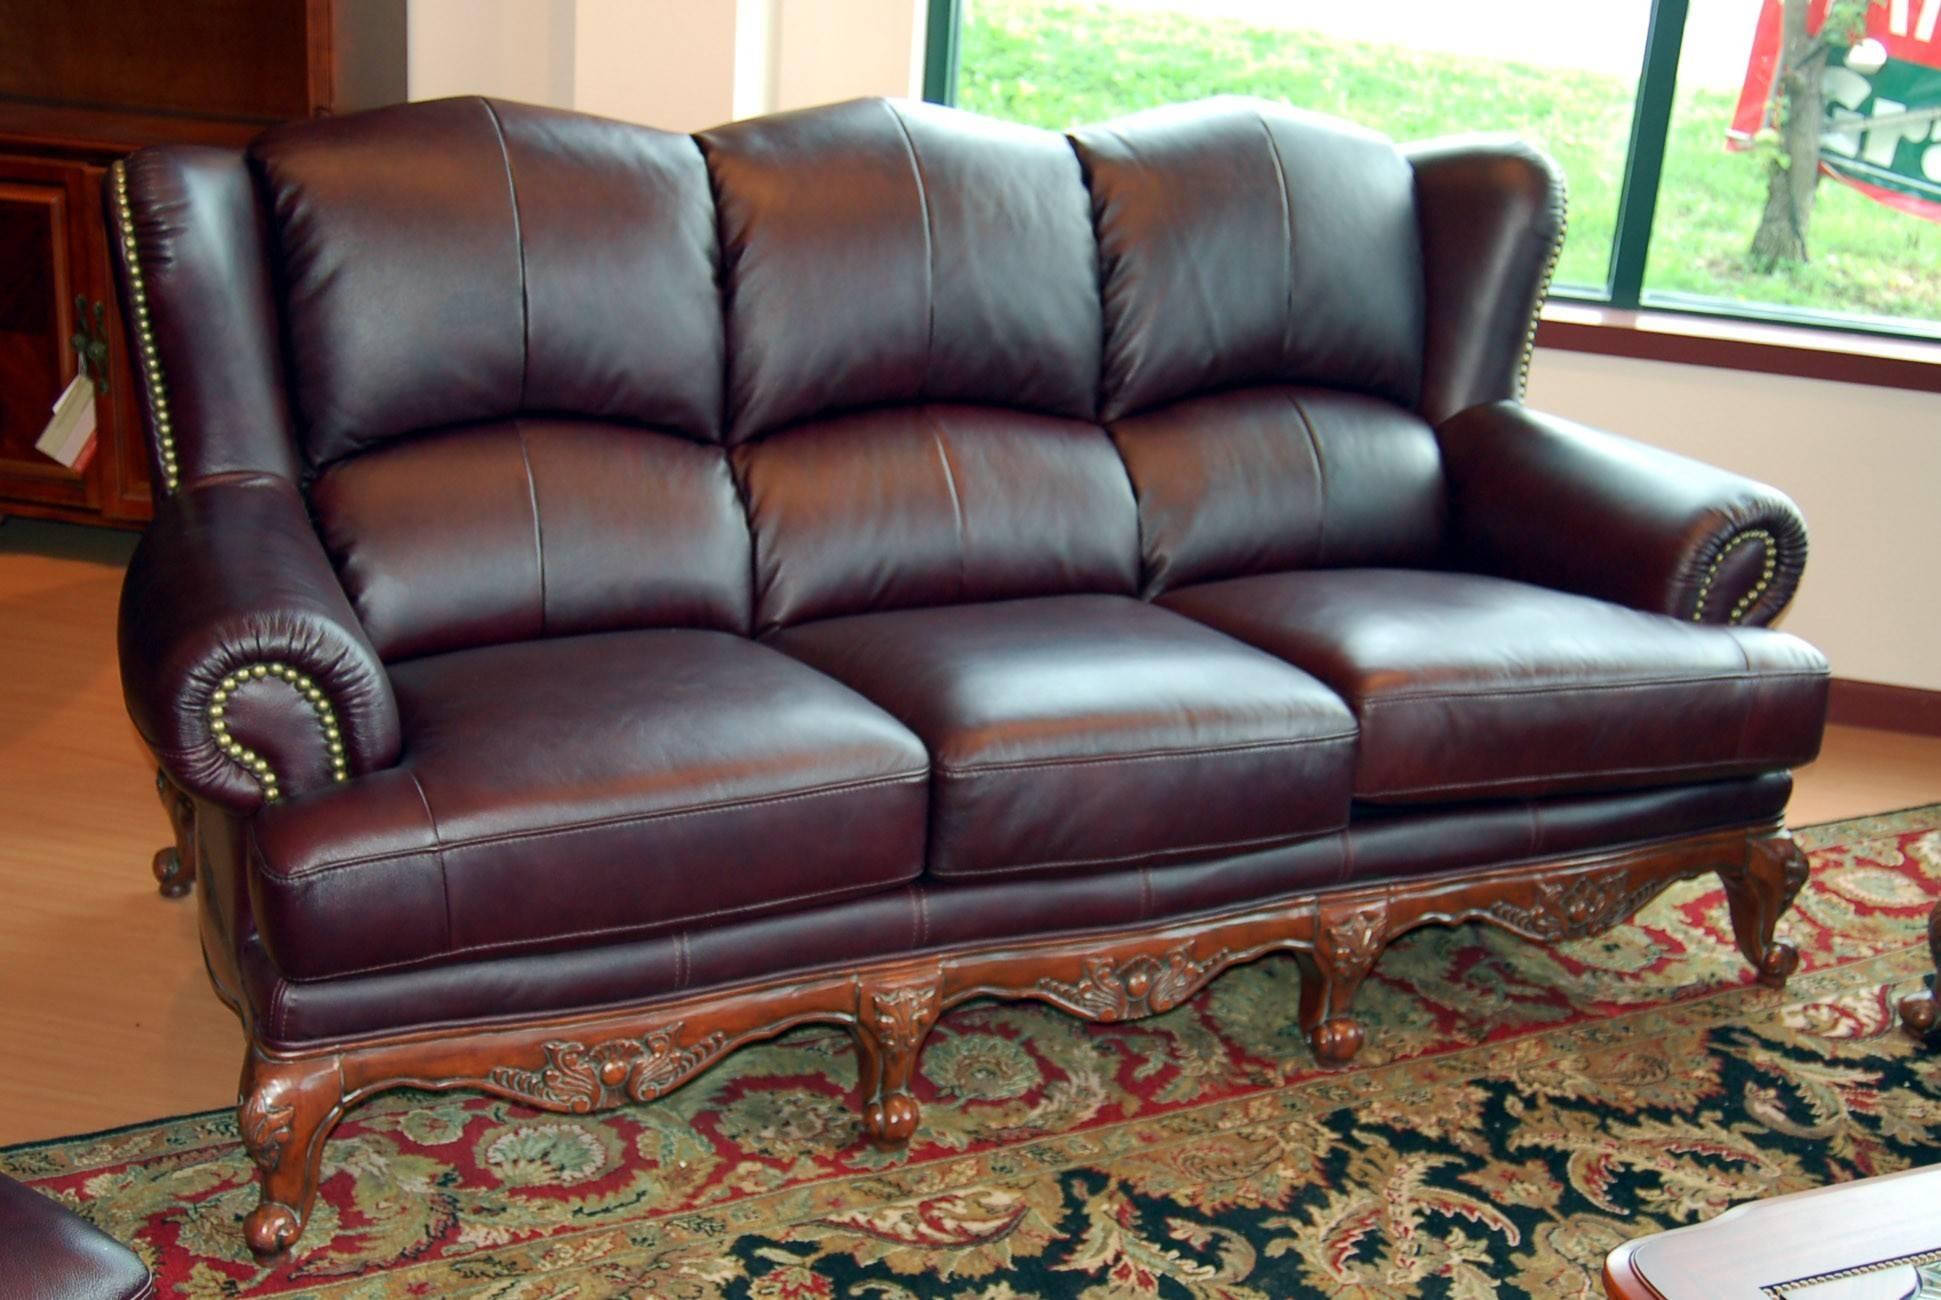 Furniture: Elegant Full Grain Leather Sofa For Luxury Living Room for Full Grain Leather Sofas (Image 16 of 30)